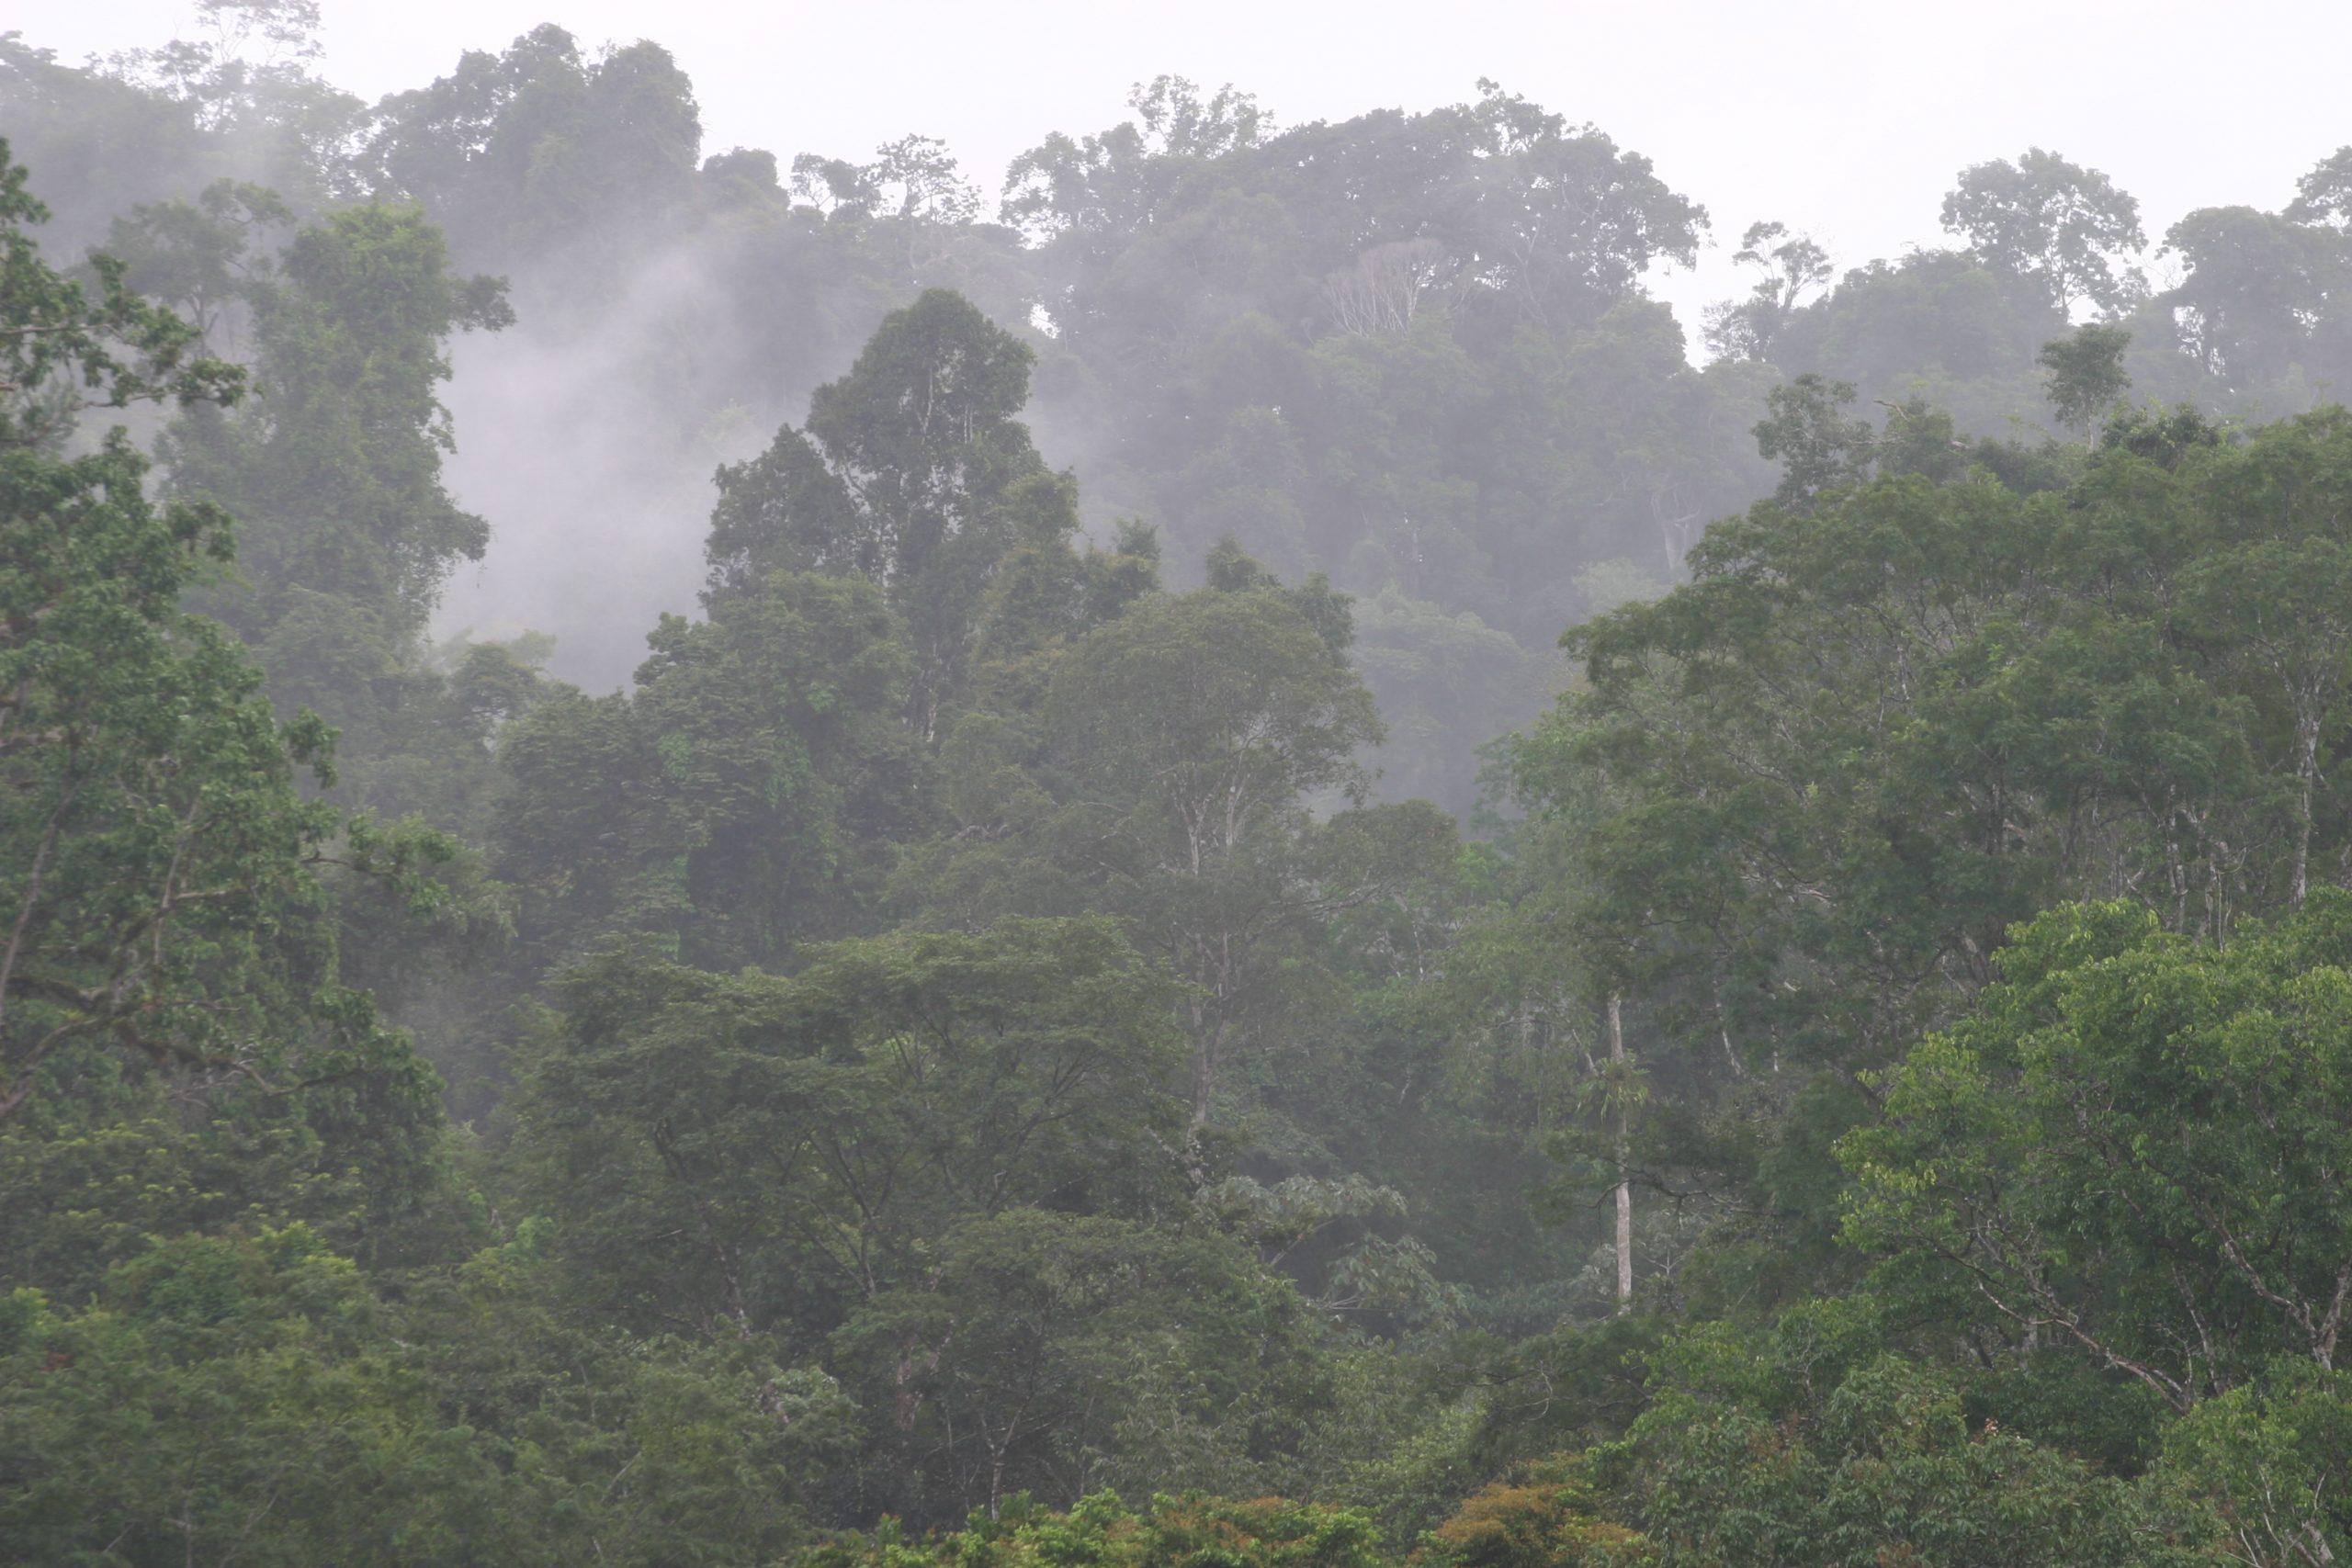 Regenwald im Nebel